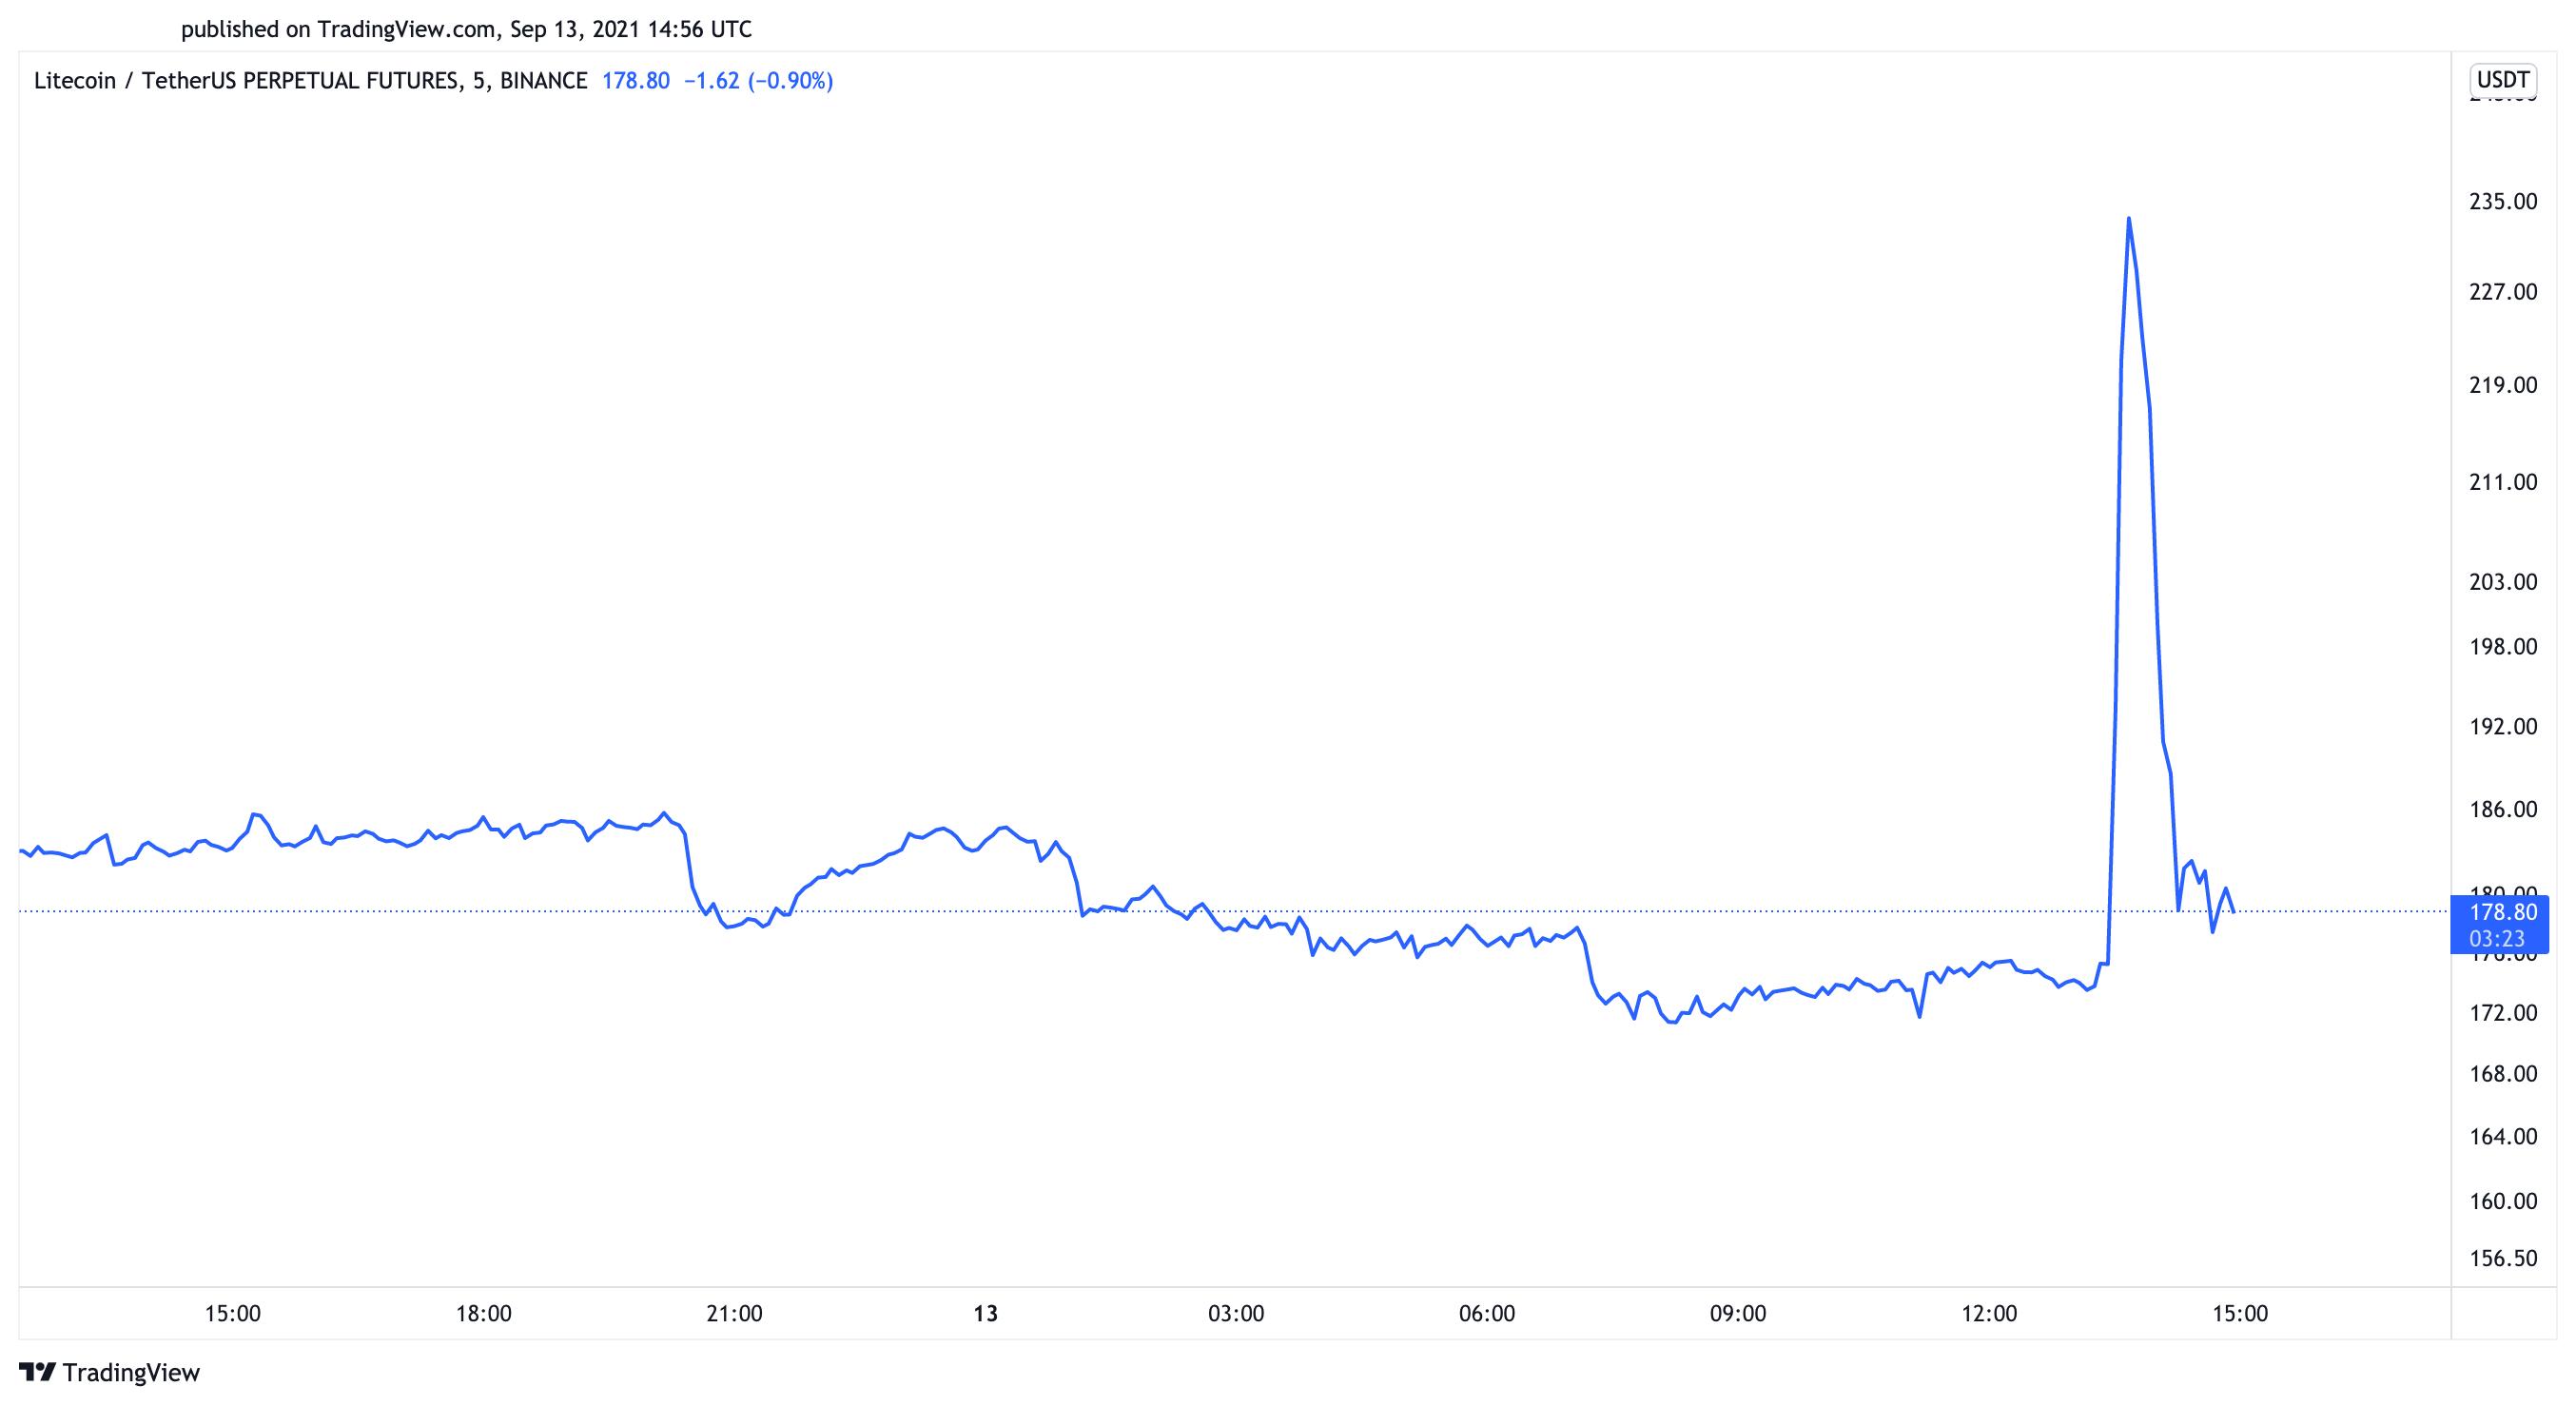 Litecoin US dollar price chart